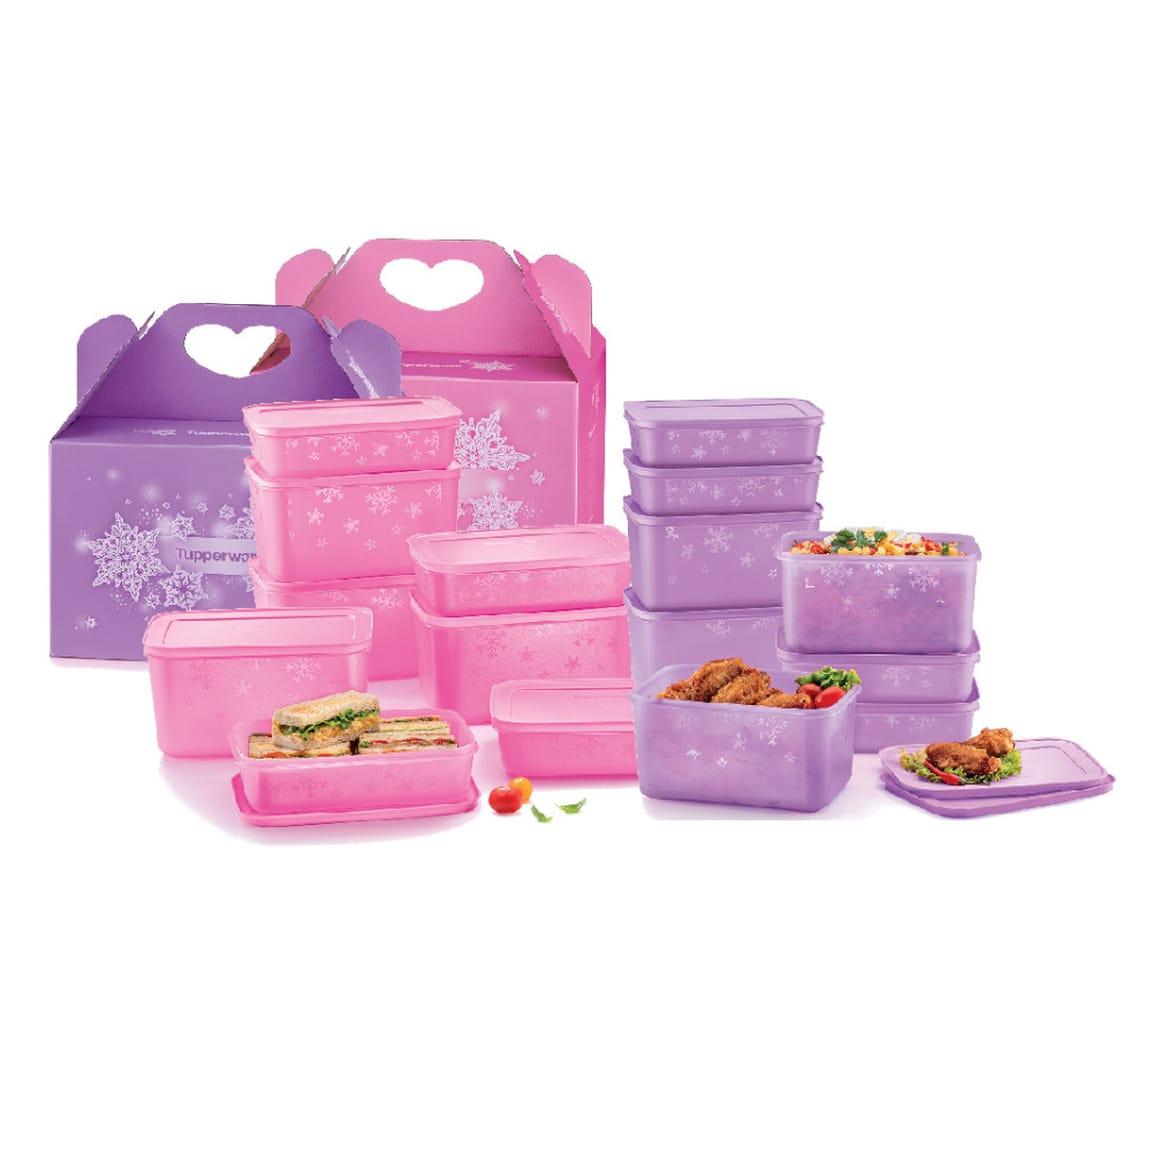 Chill-Freez Medium Set - Pink or Purple (PWP)